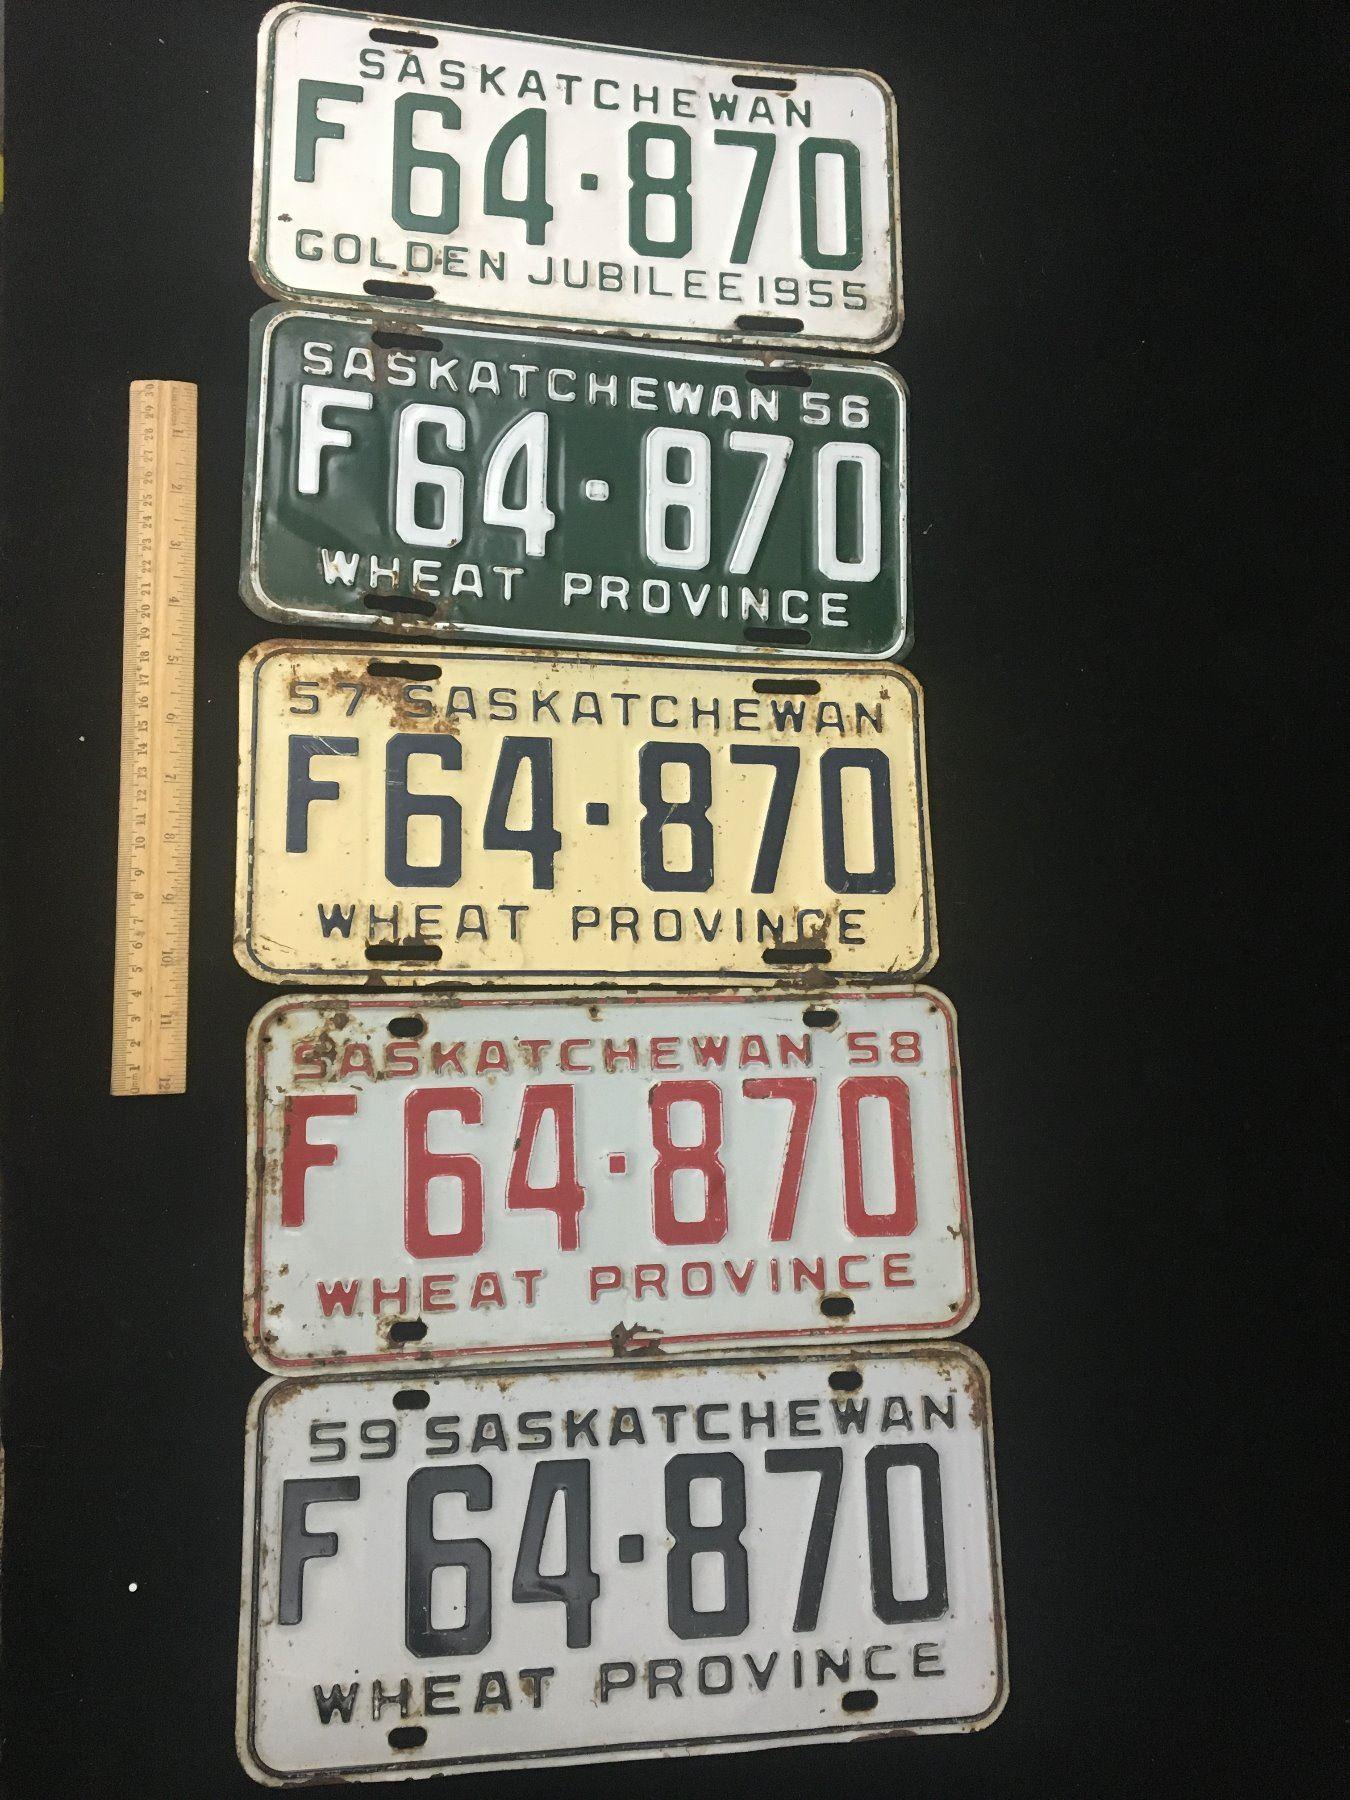 Saskatchewan Licence Plate Sets Unique Lot Of 5 Same Licence Number Different Years 1955 56 57